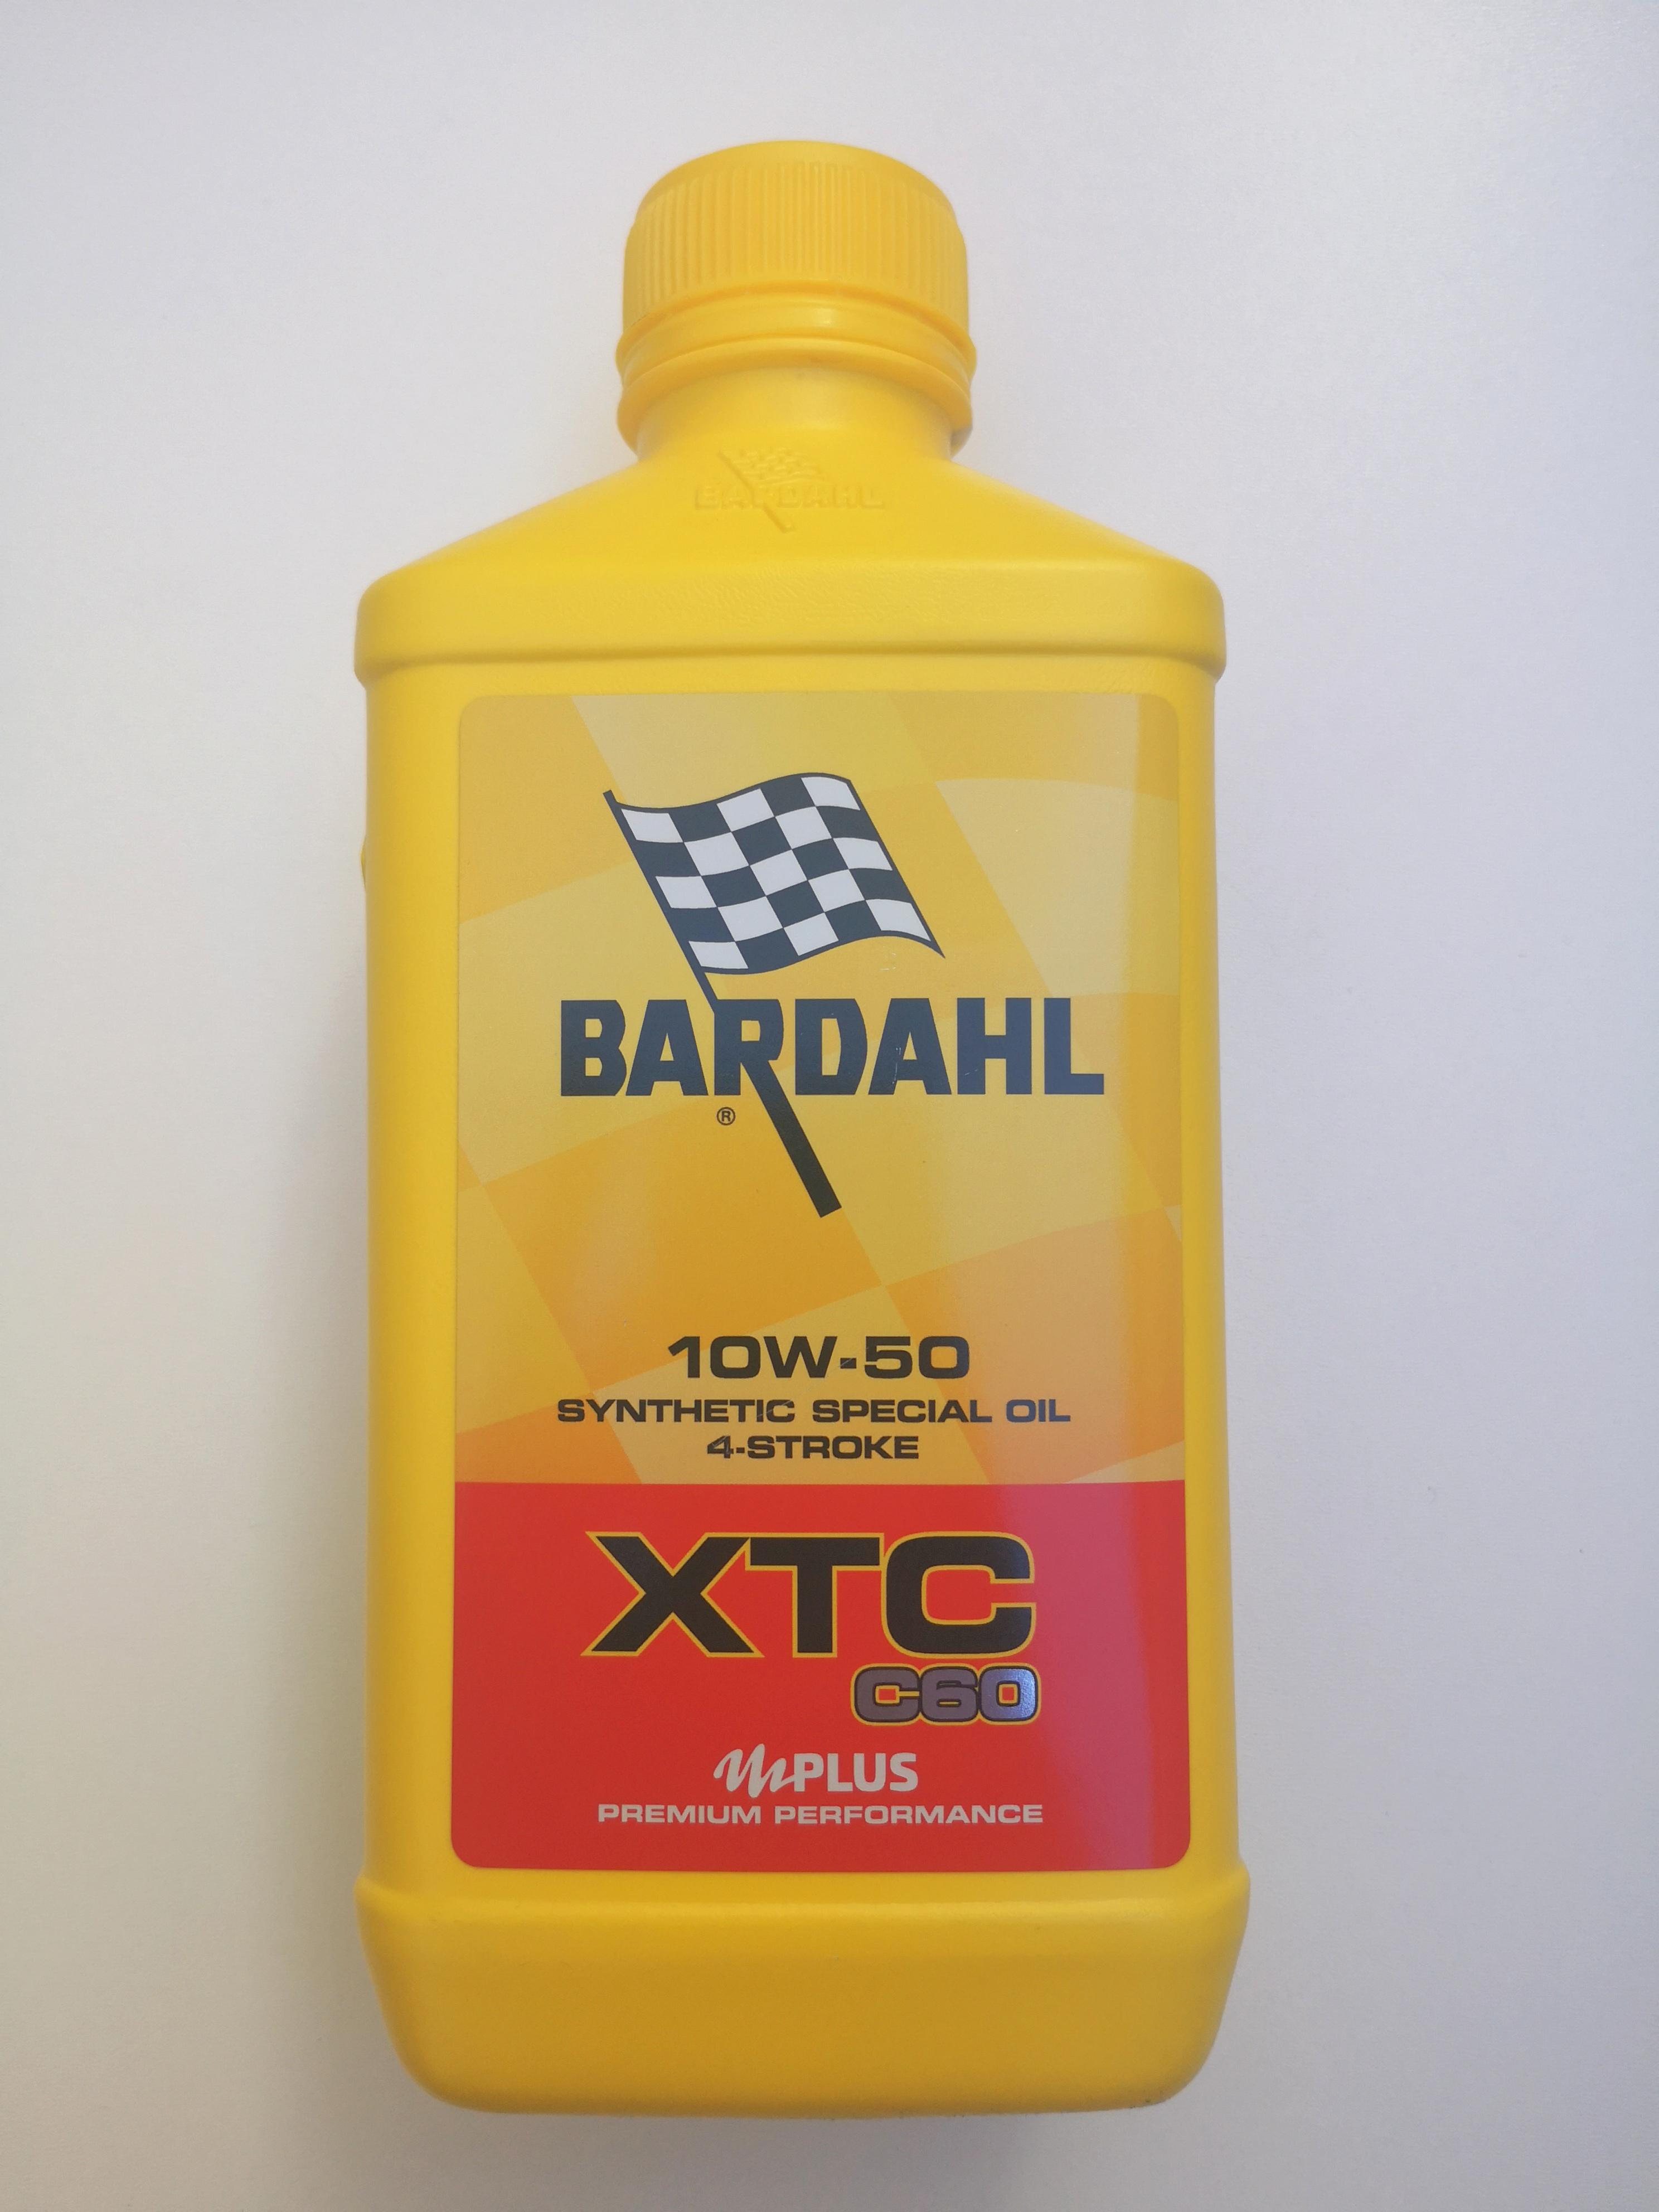 BARDAHL XTC C60 per MOTO e SCOOTER 4 TEMPI  - 100% SINTETICO  SAE 10W50 - MOTOFORNITURE GF